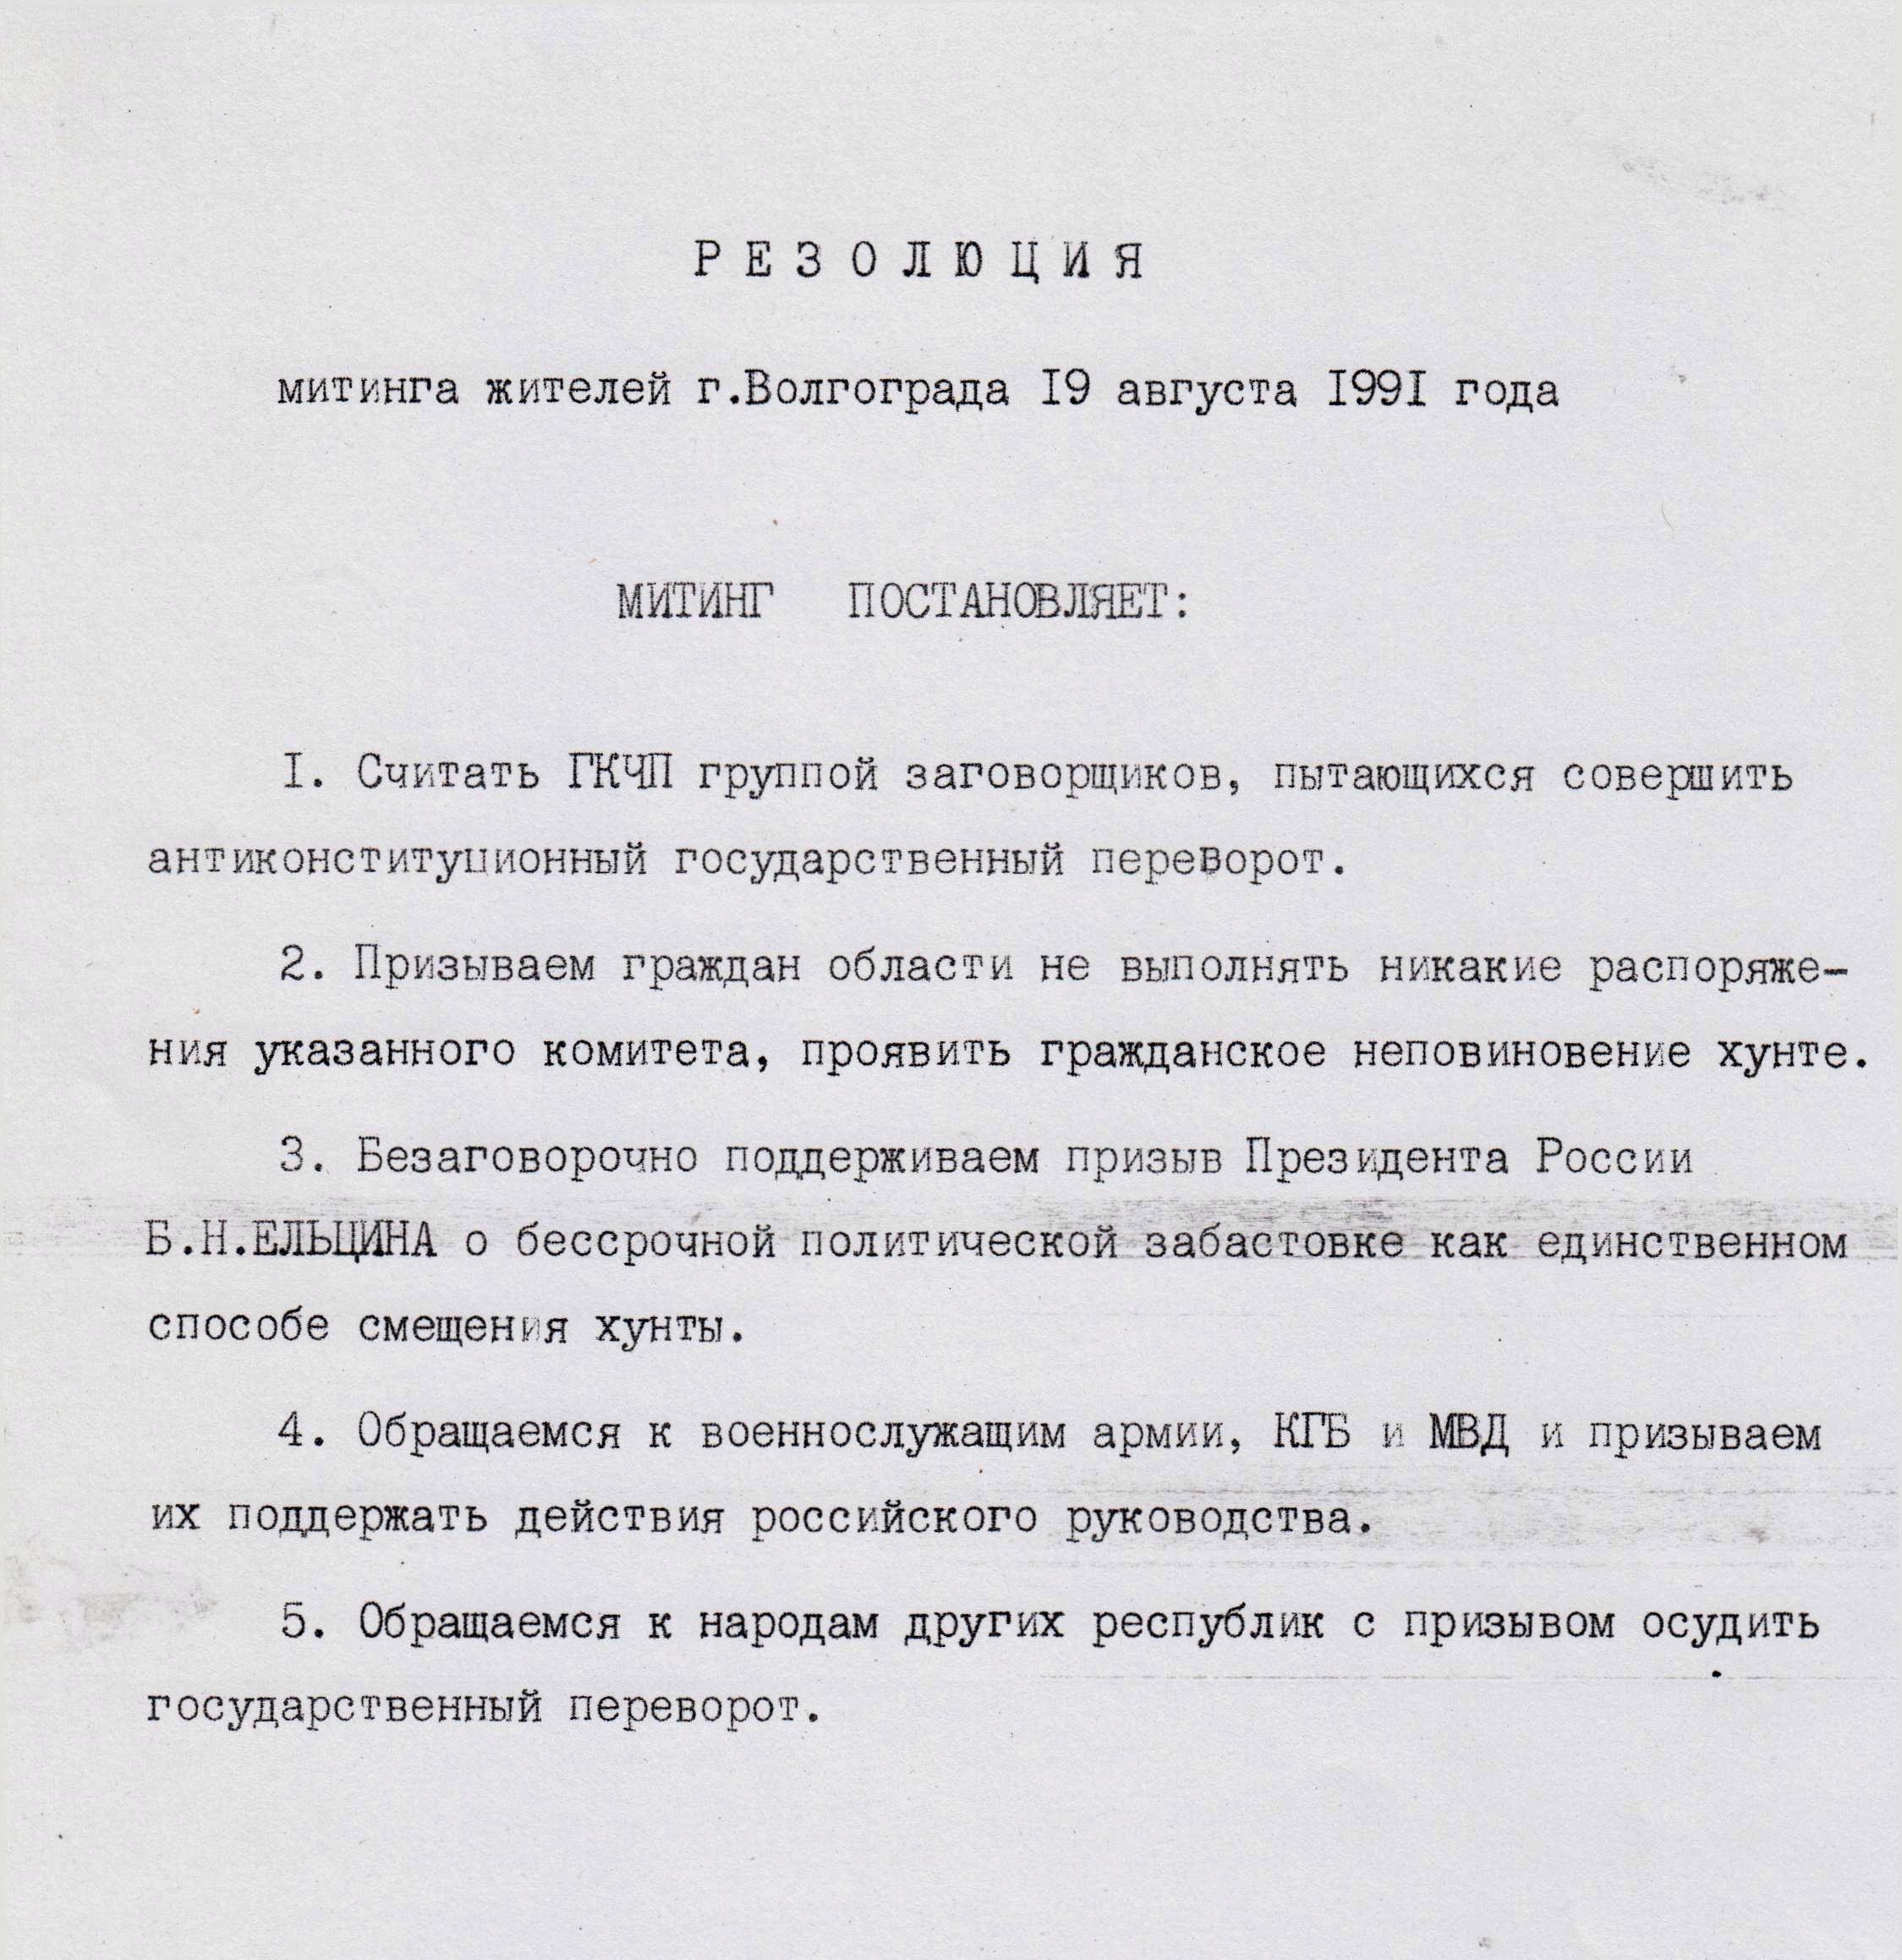 19_августа_1991_резолюция